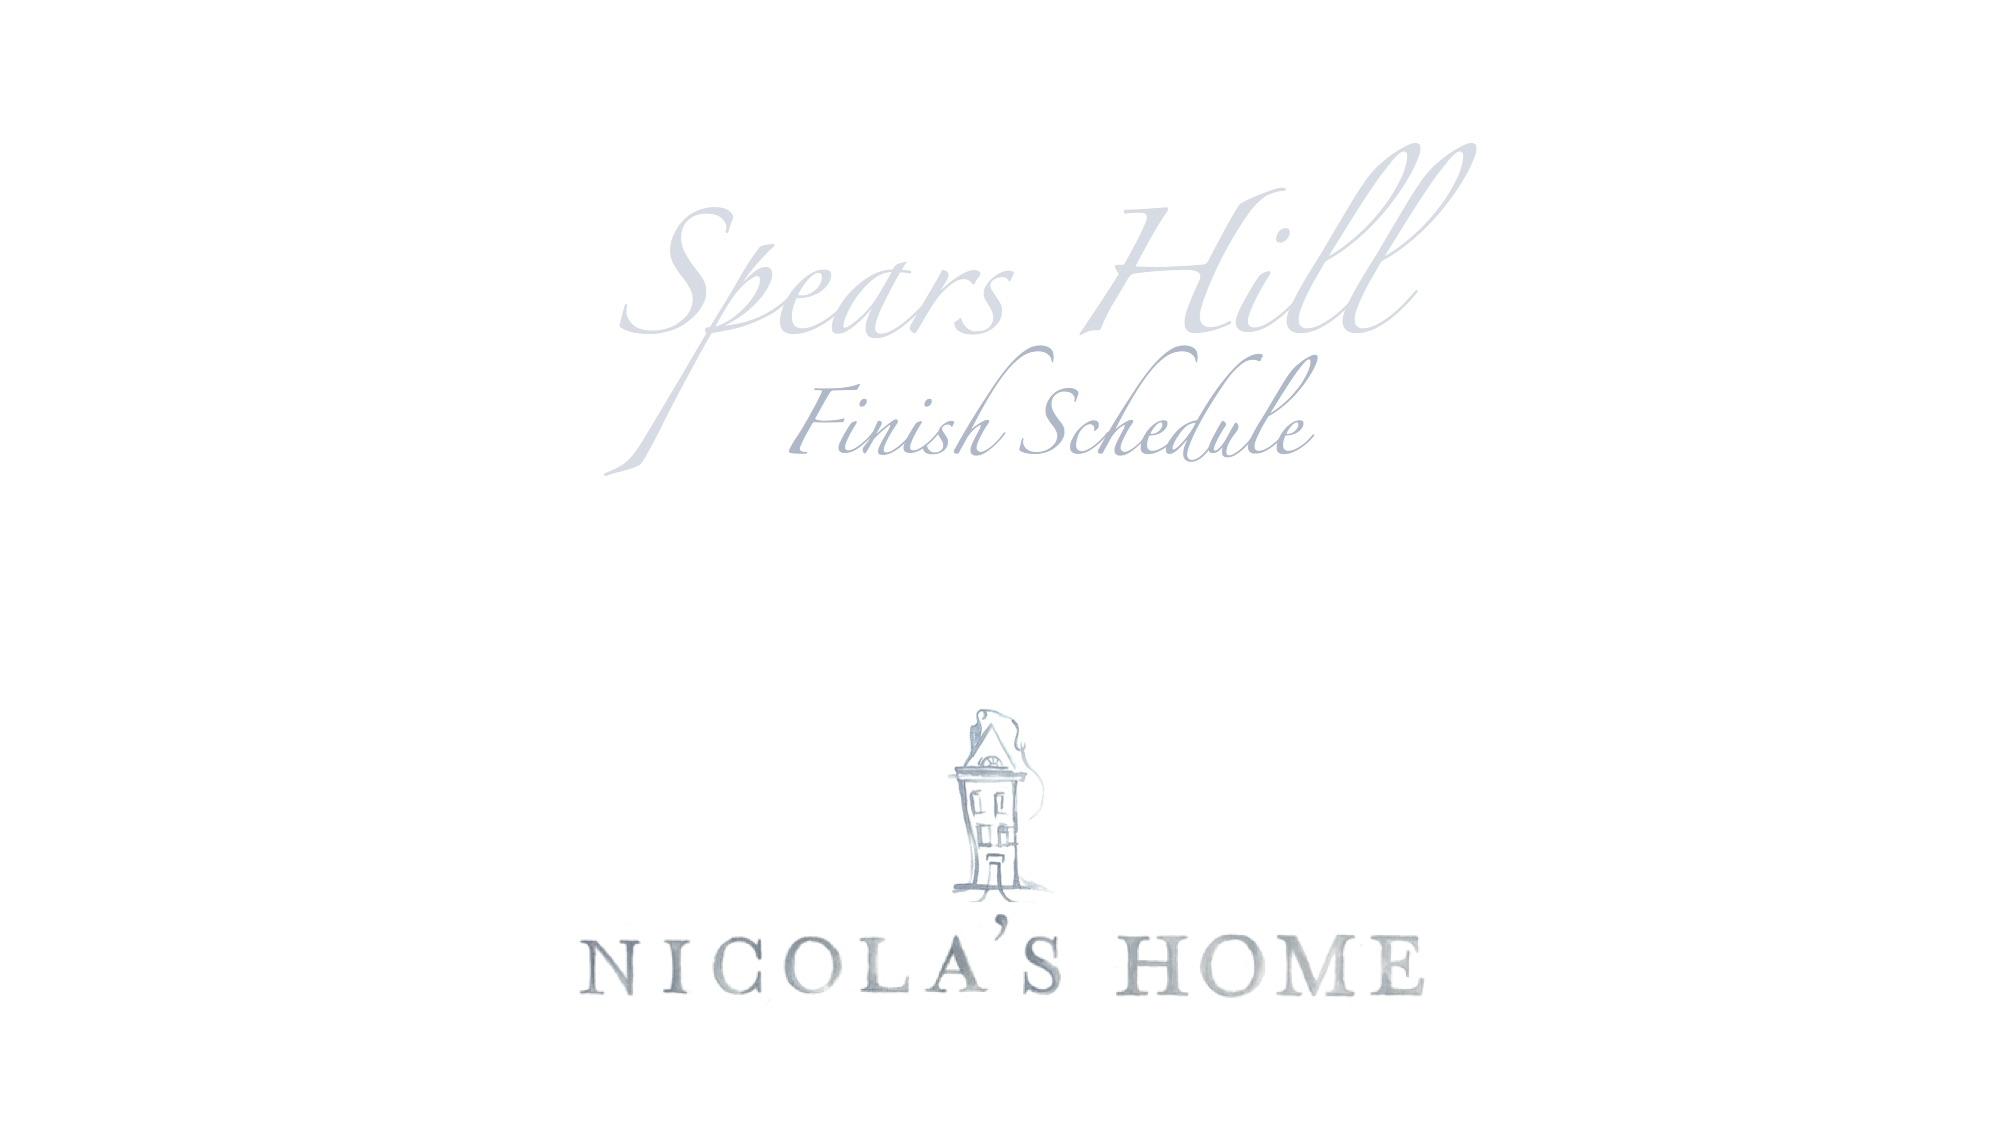 Spears Hill Finish Schedule.jpg